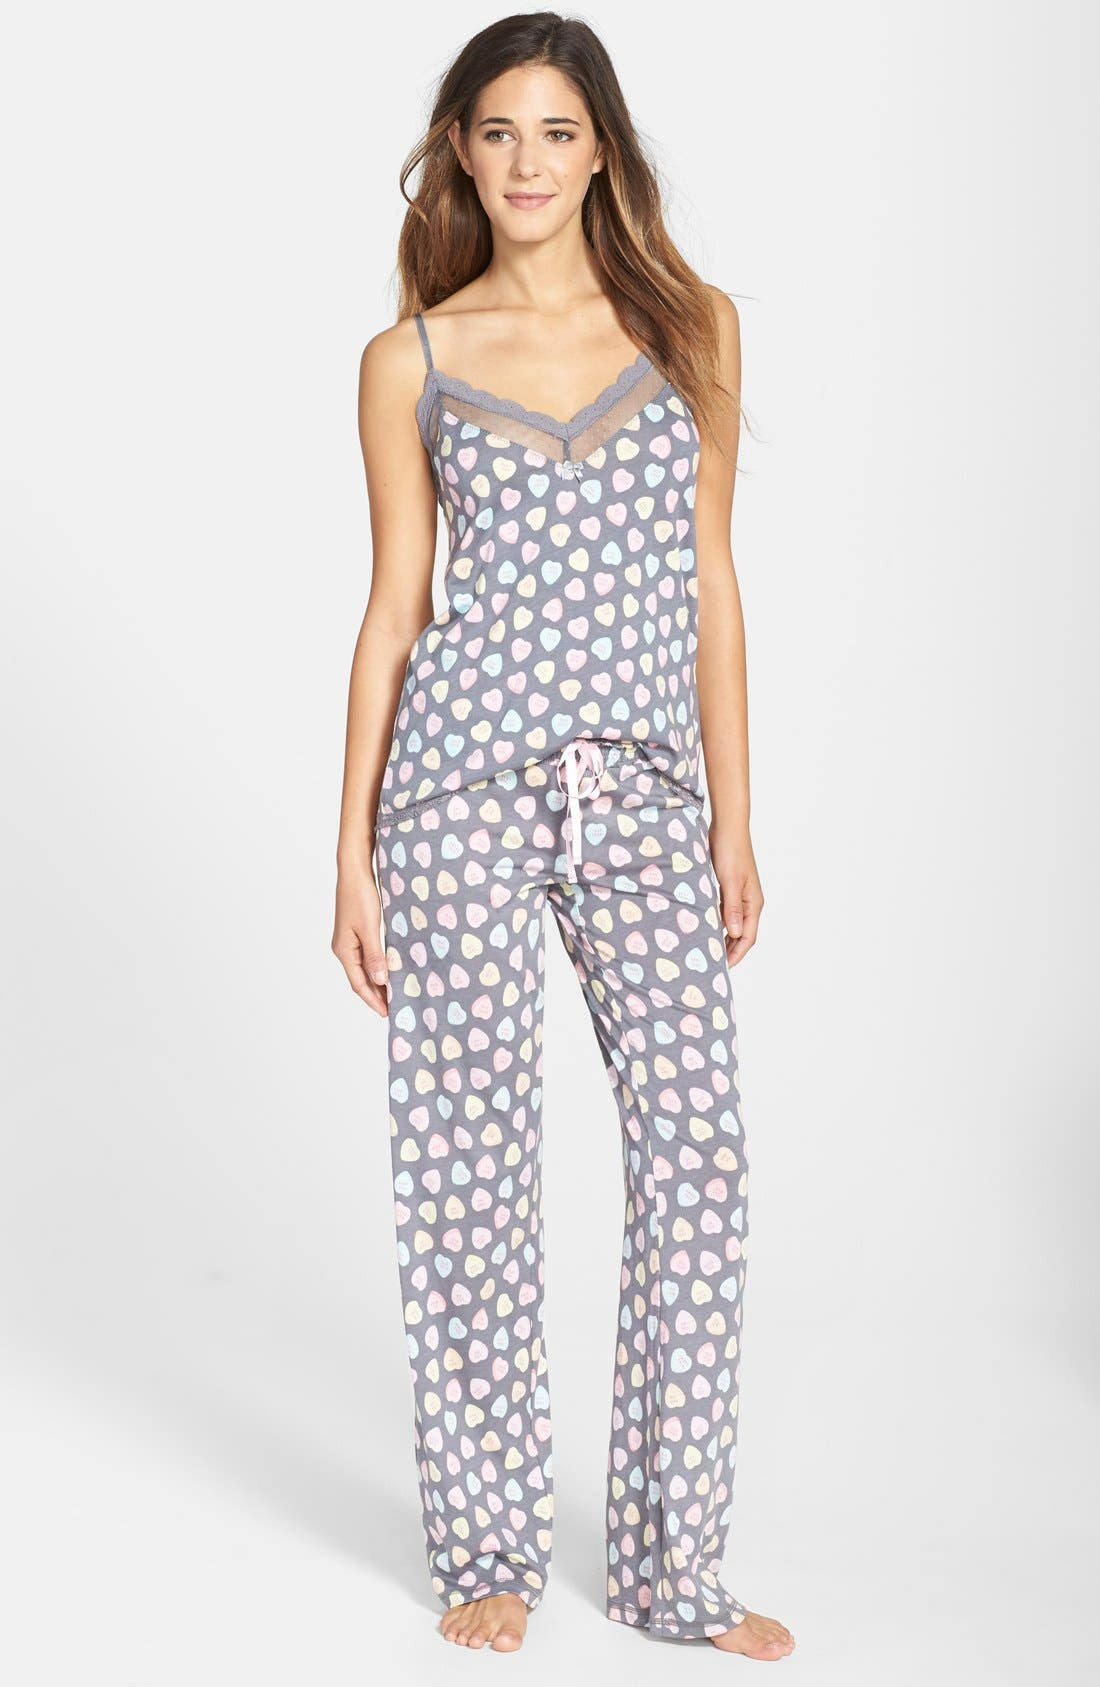 PJ SALVAGE,                             'Candy Hearts' Pajama Pants,                             Alternate thumbnail 2, color,                             020